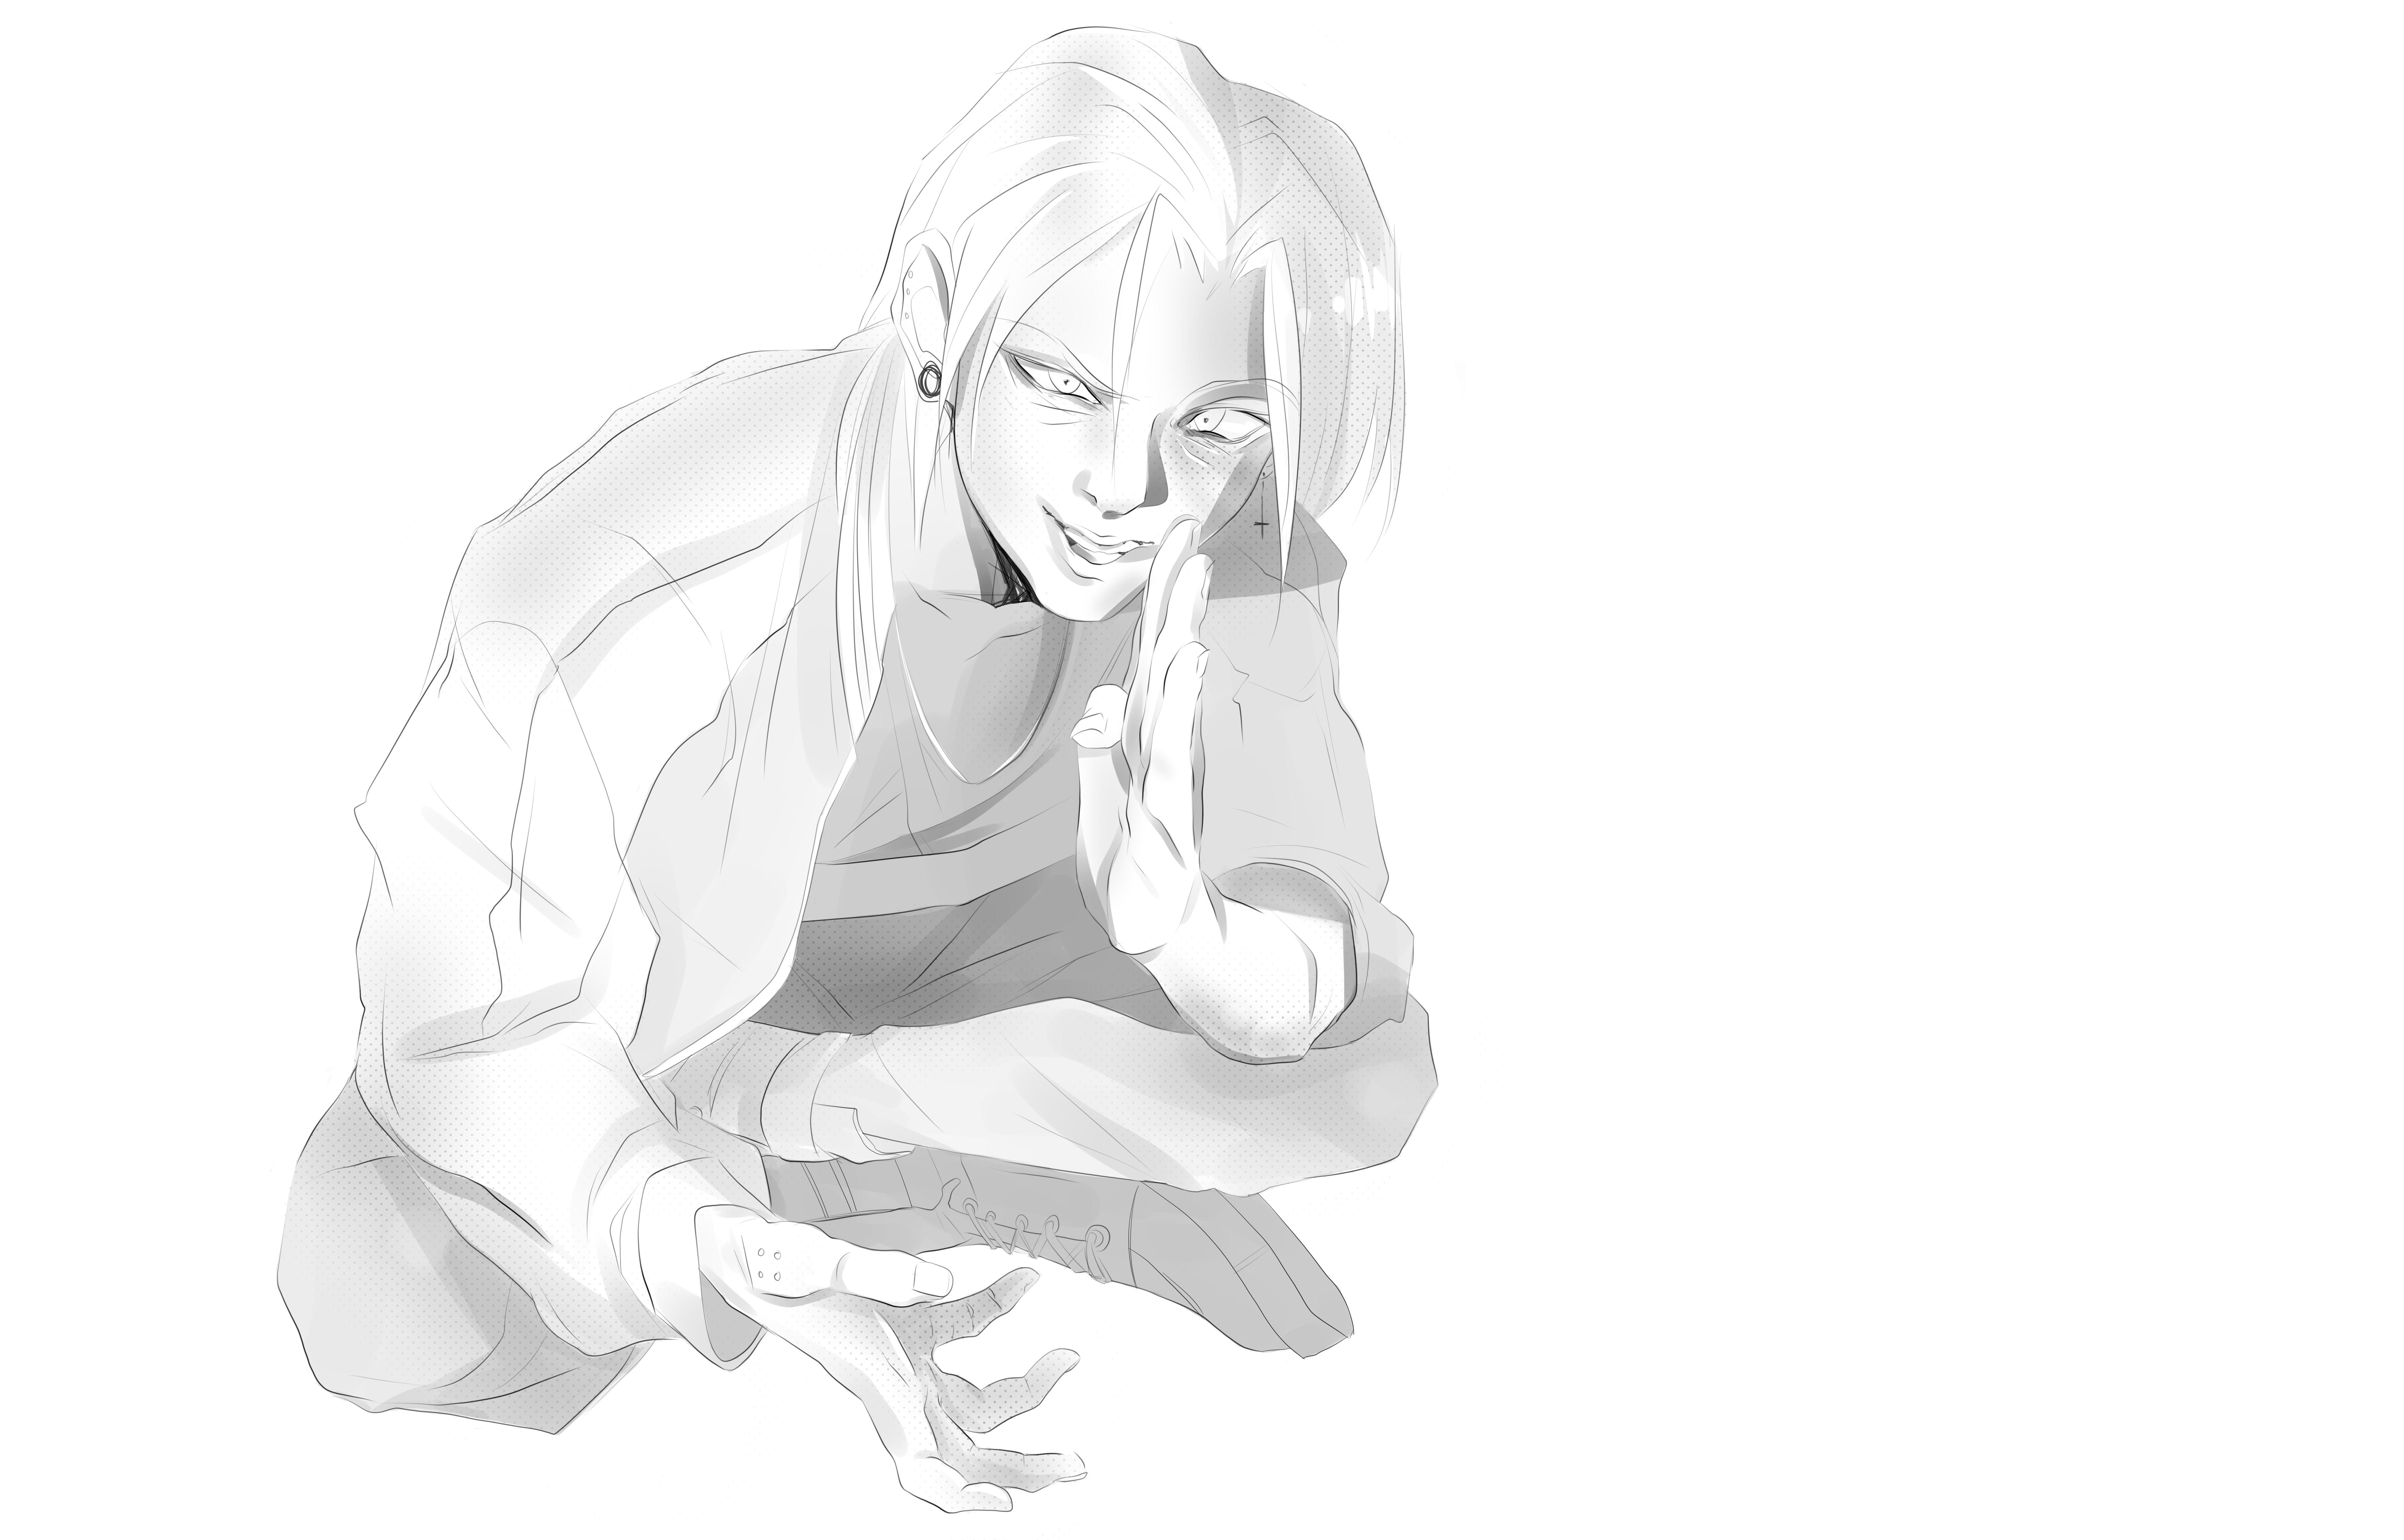 [Akte] Uzumaki Haruko Jzsjym63